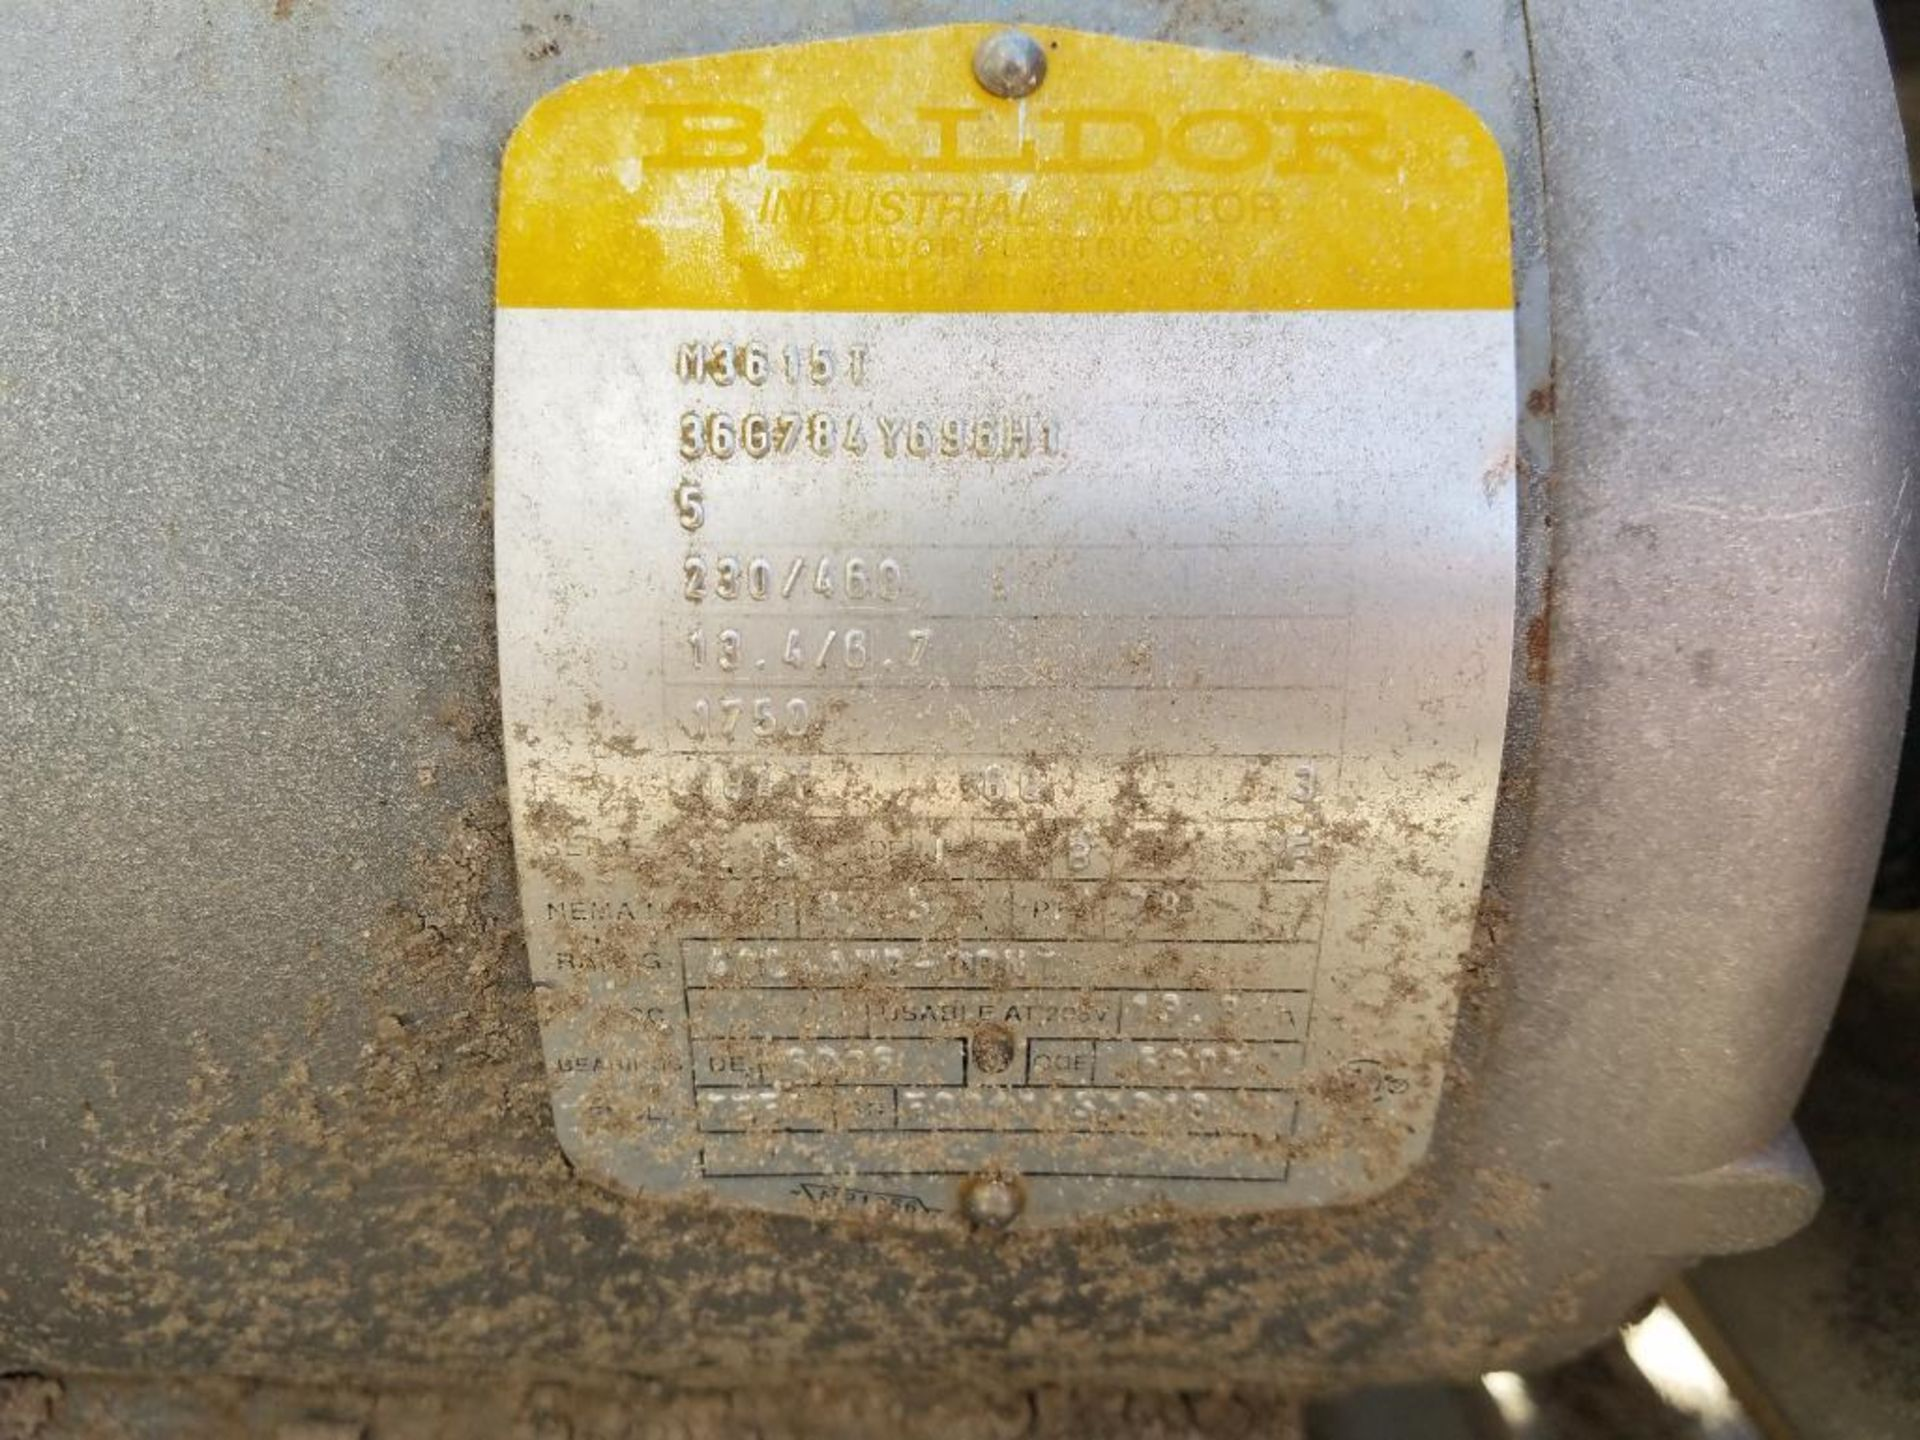 CAT high pressure piston pump - Image 4 of 4